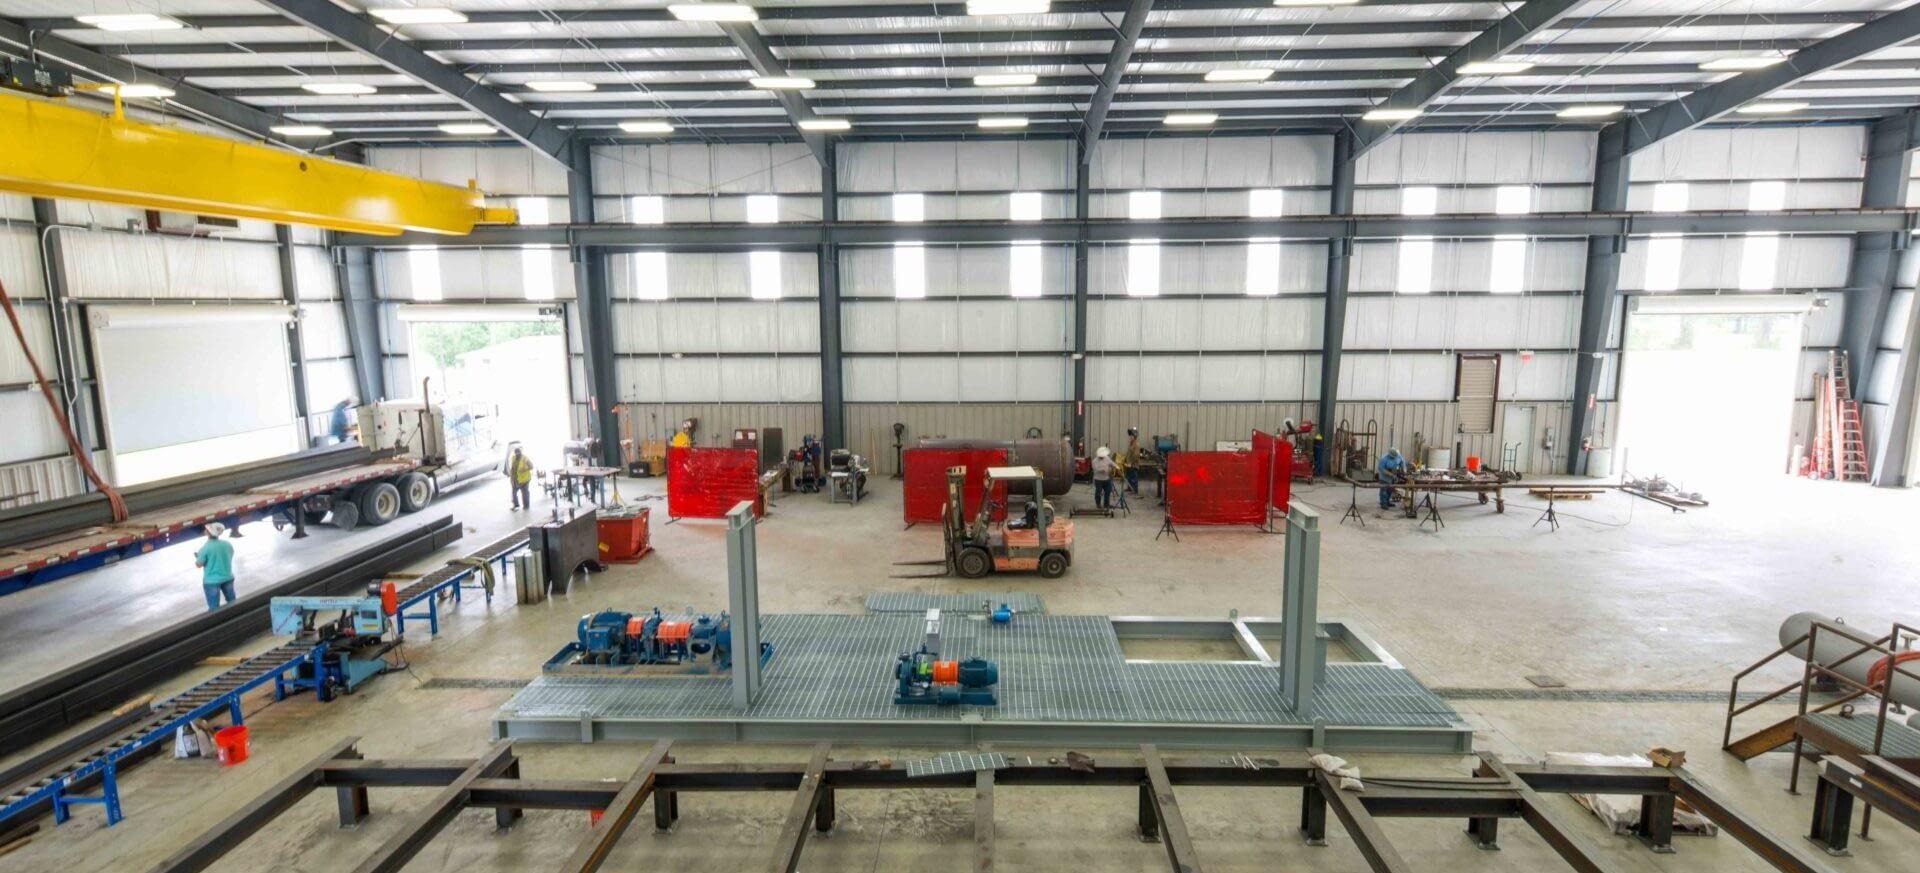 Modular equipment fabrication